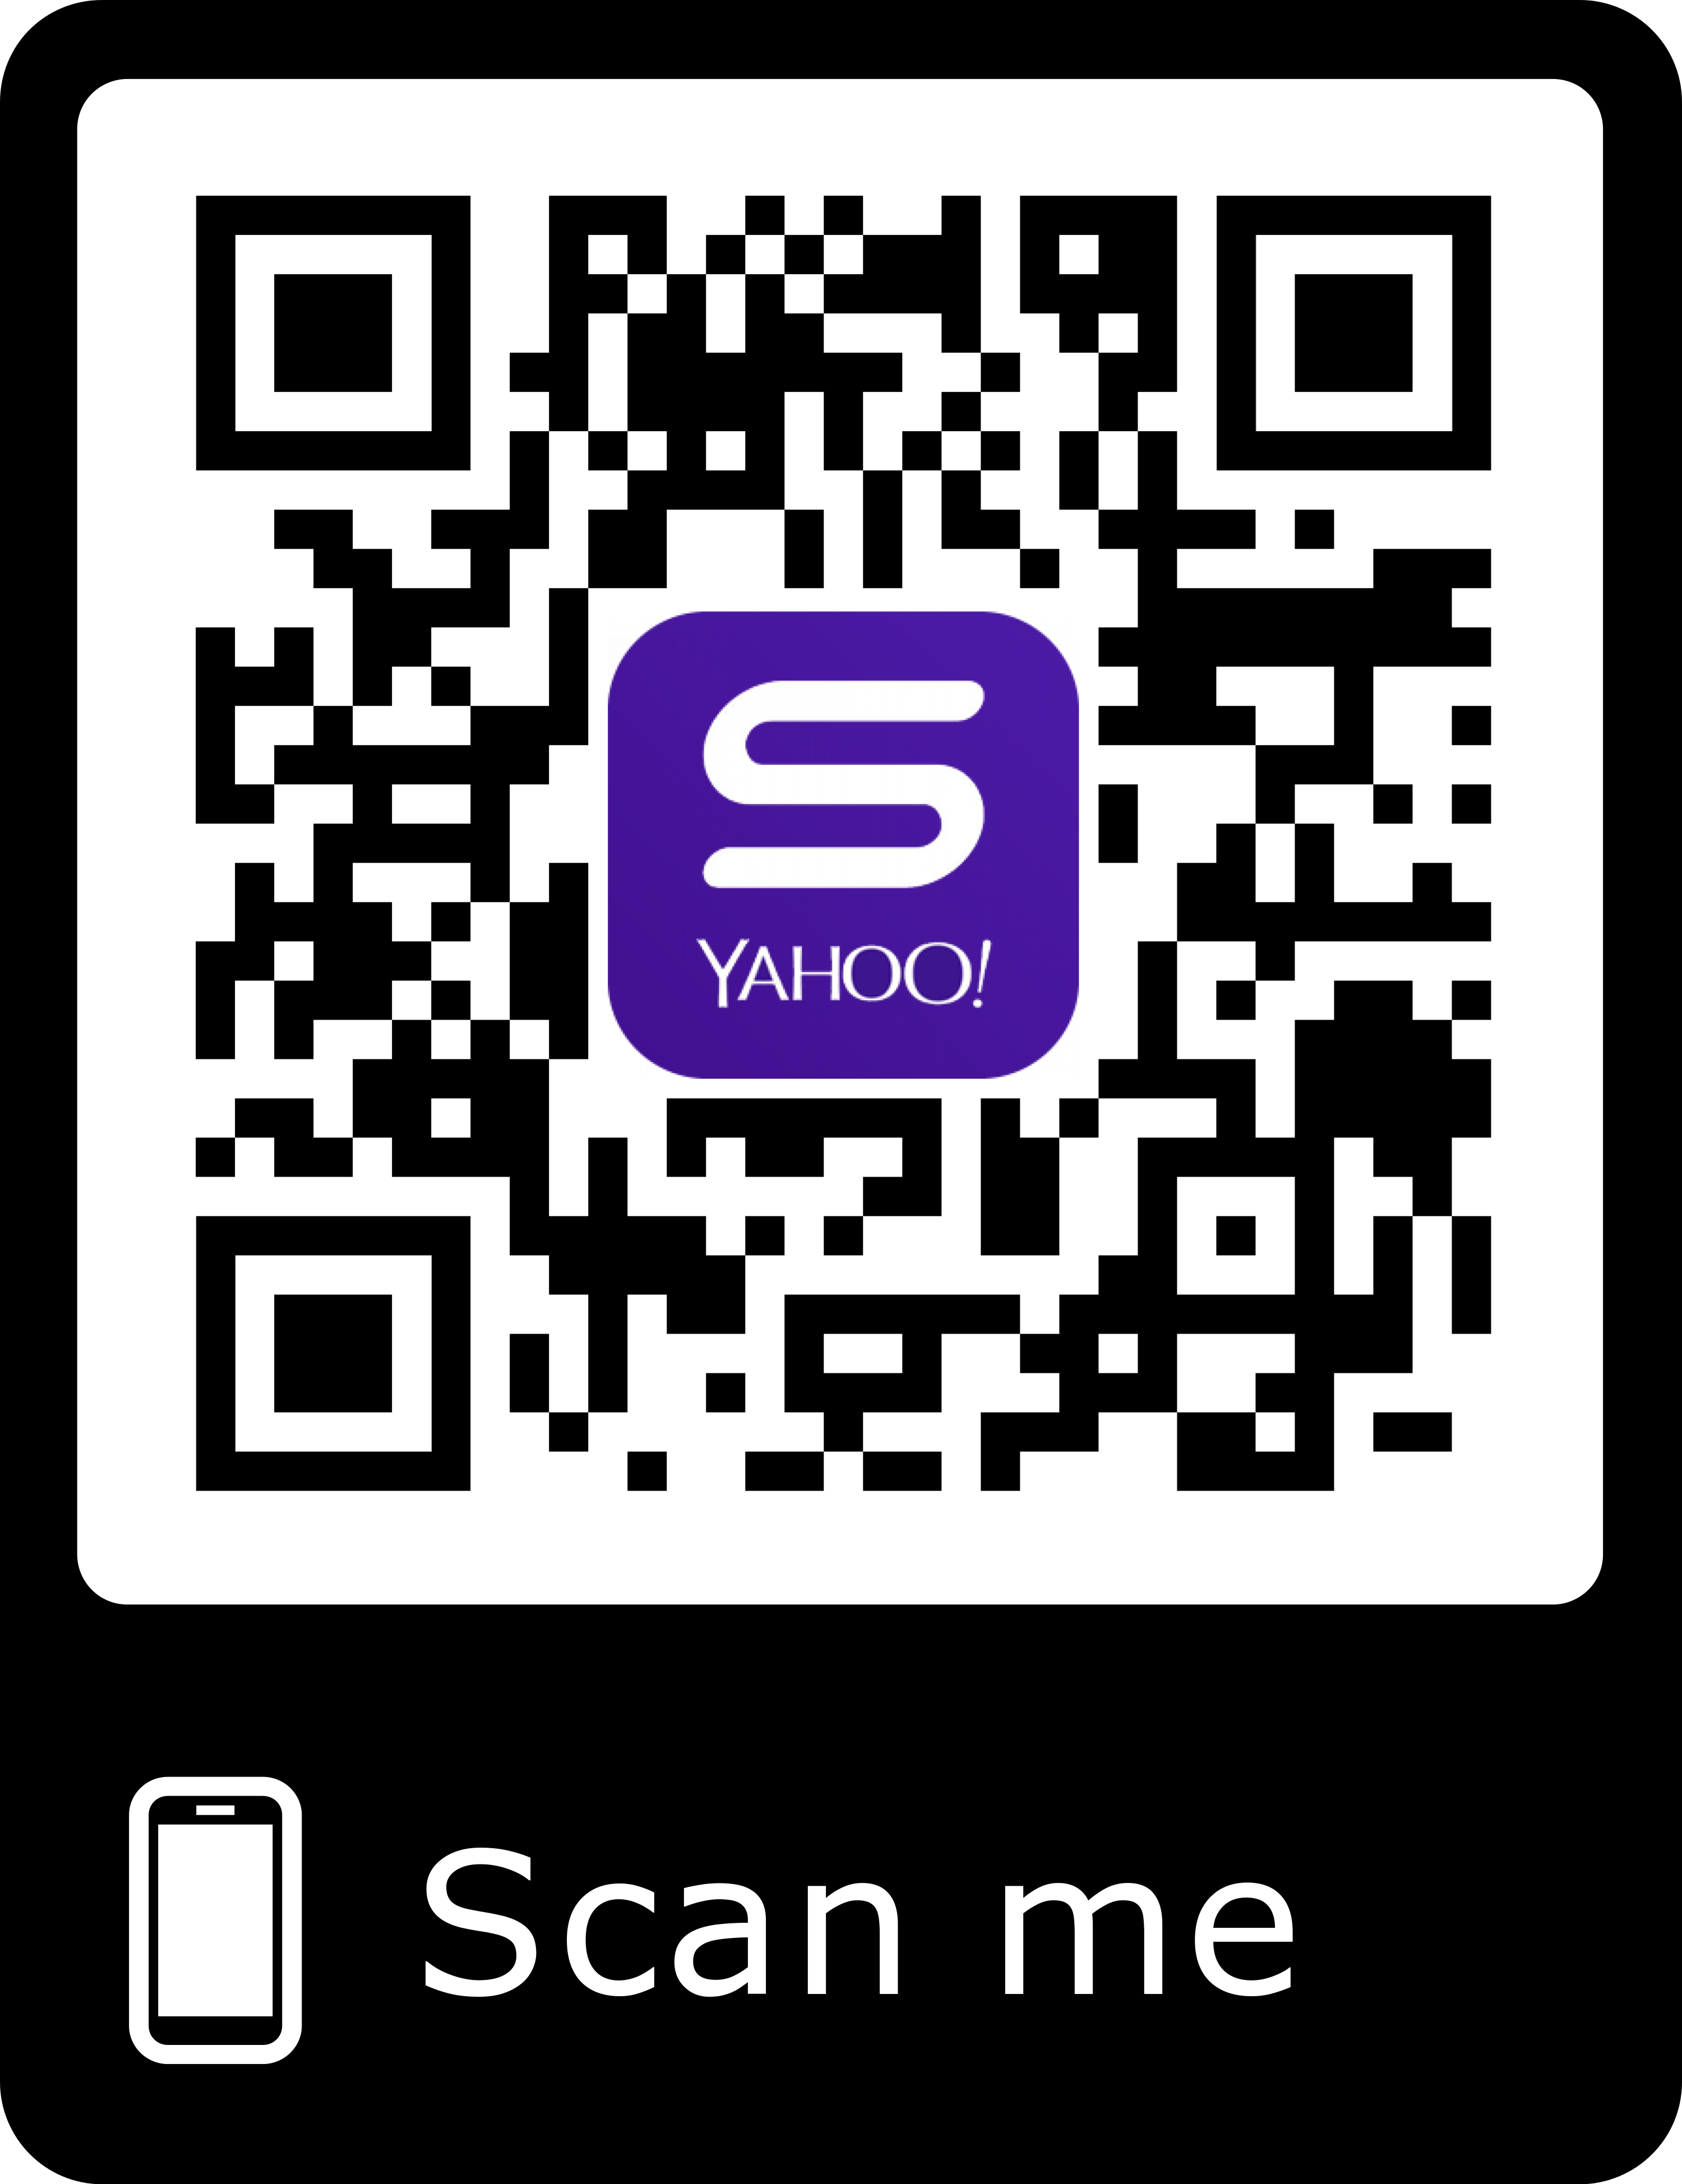 yahoo mobile QR code